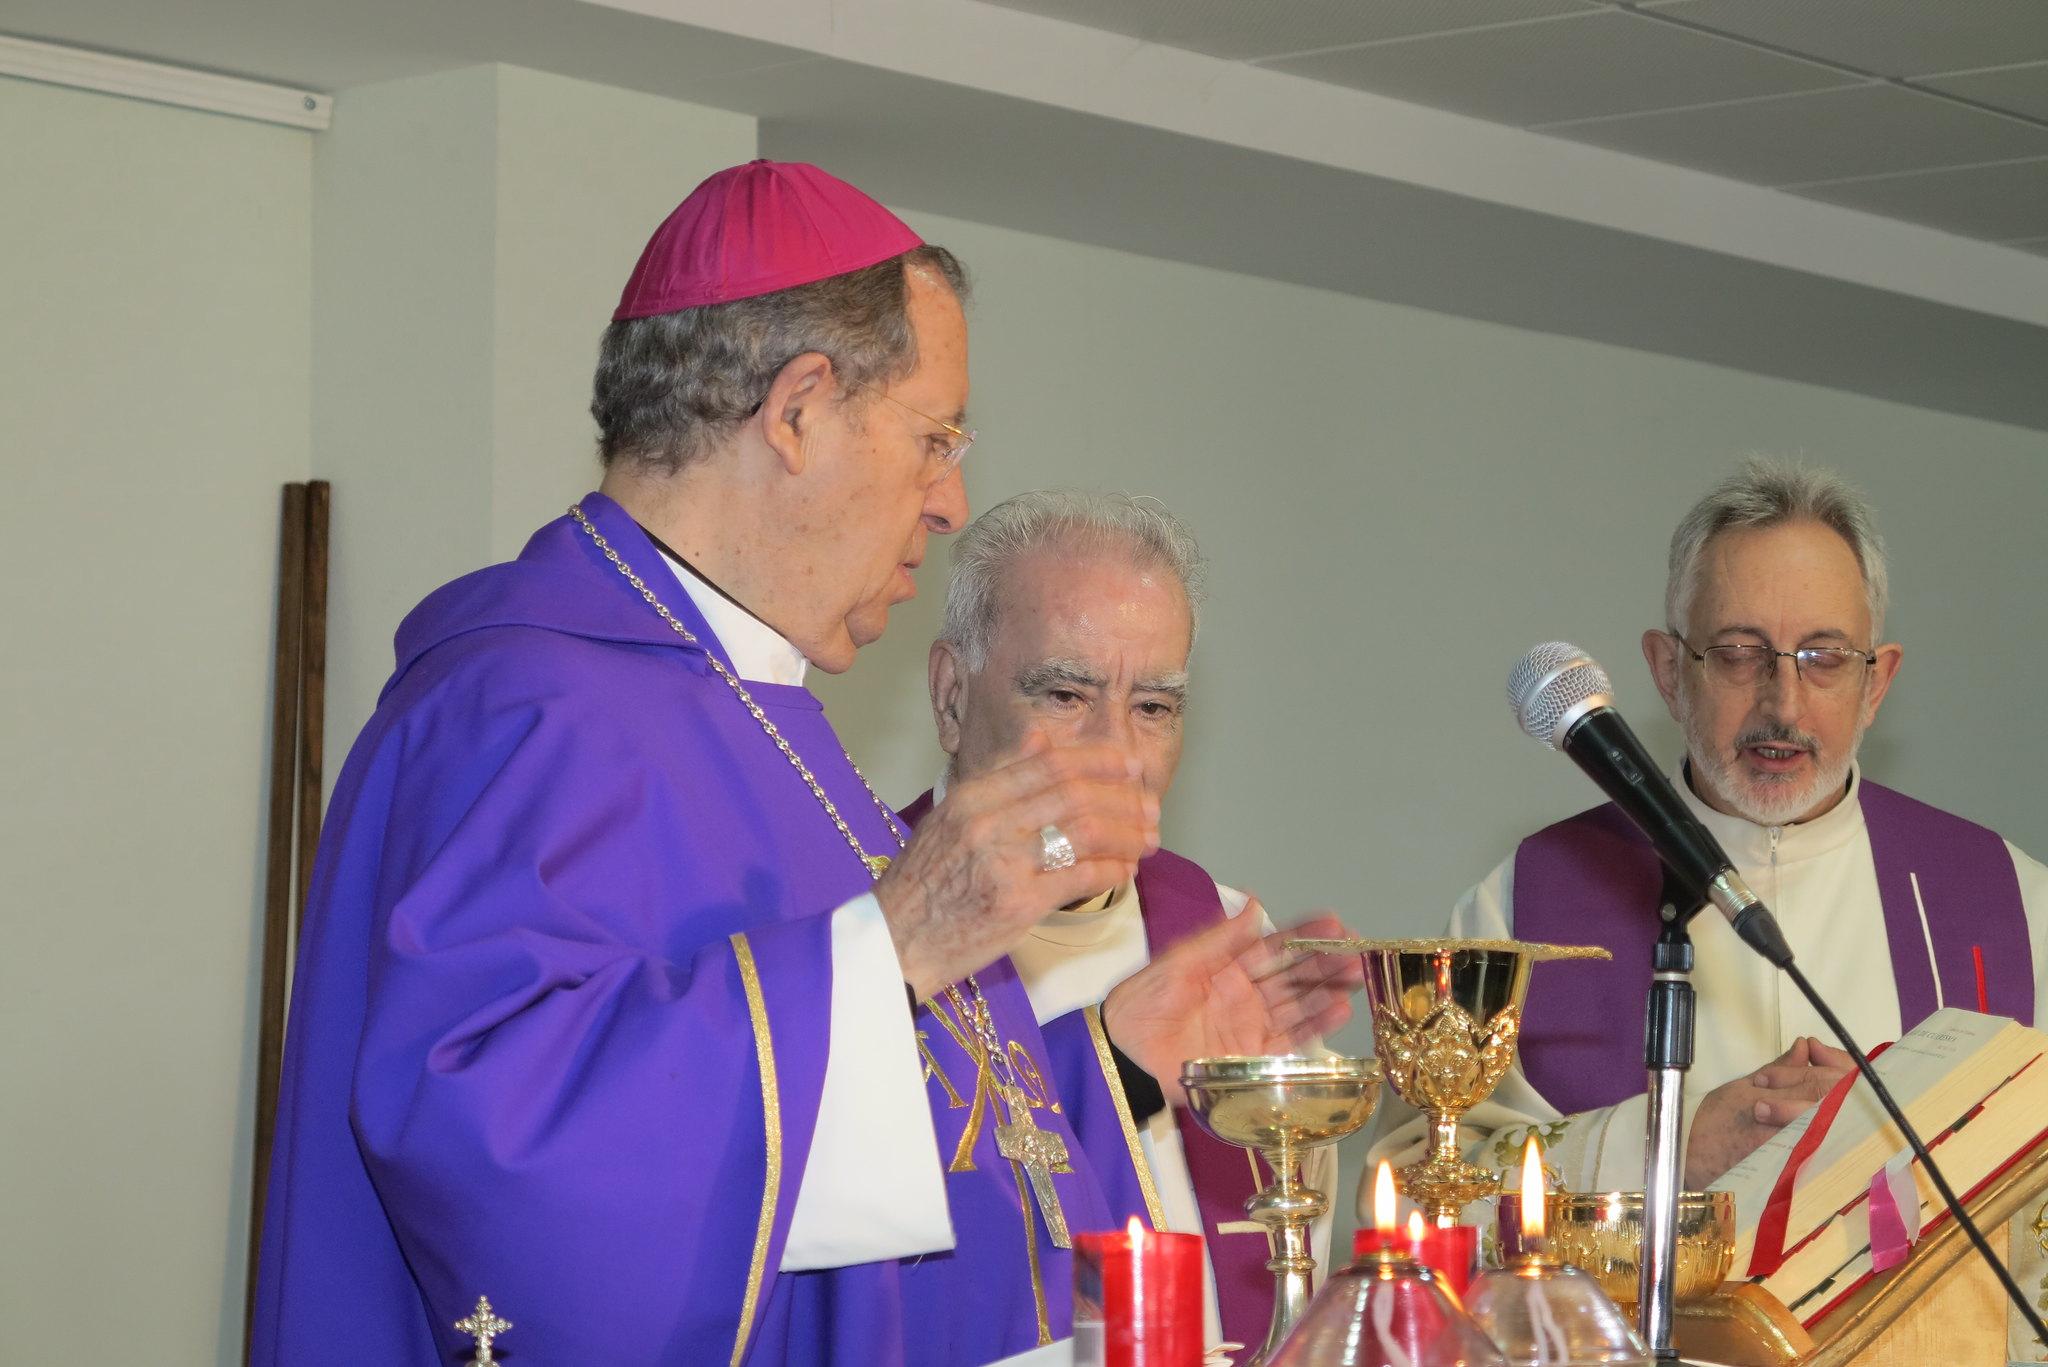 (2016-02-13) - Inauguración Virgen de Lourdes, La Molineta - Archivo La Molineta 2 (31)